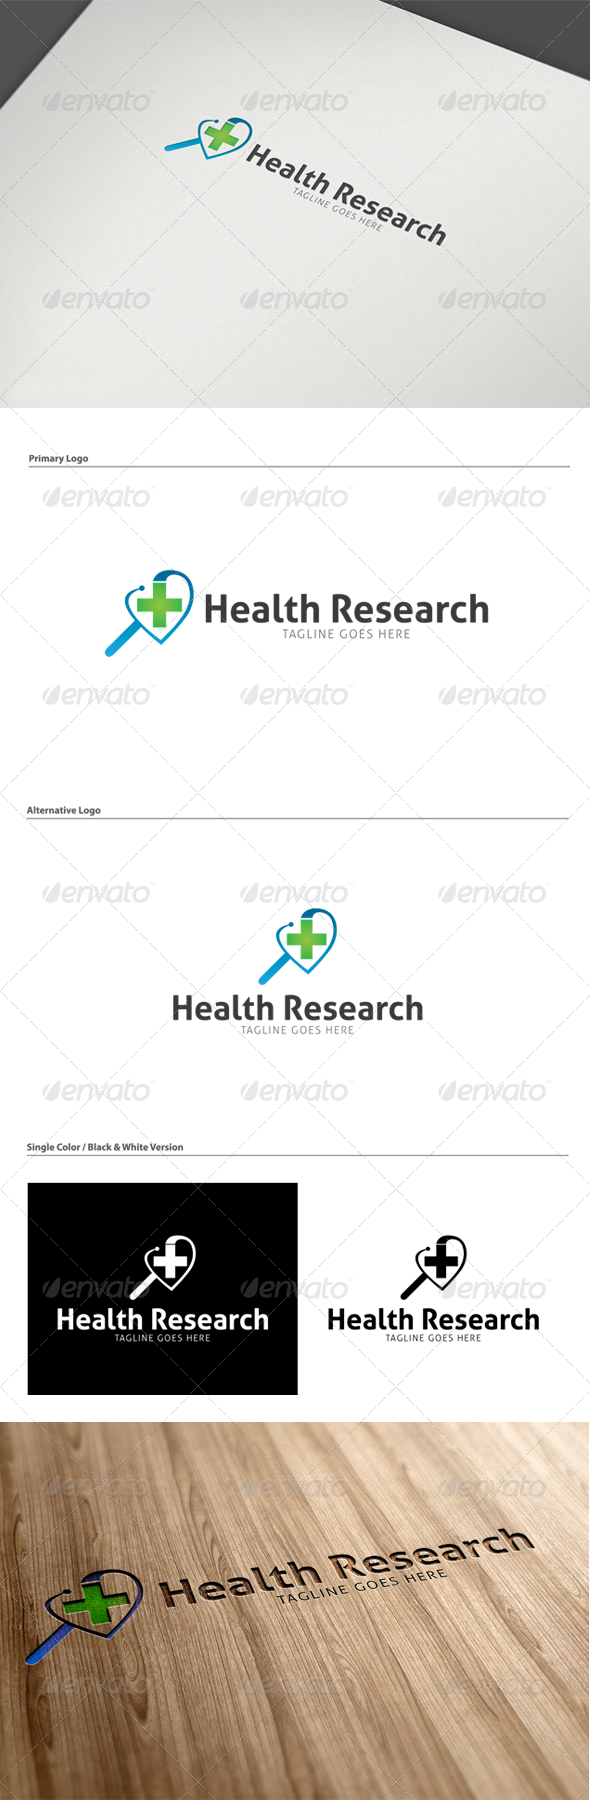 GraphicRiver Health Research Logo Template 5272841